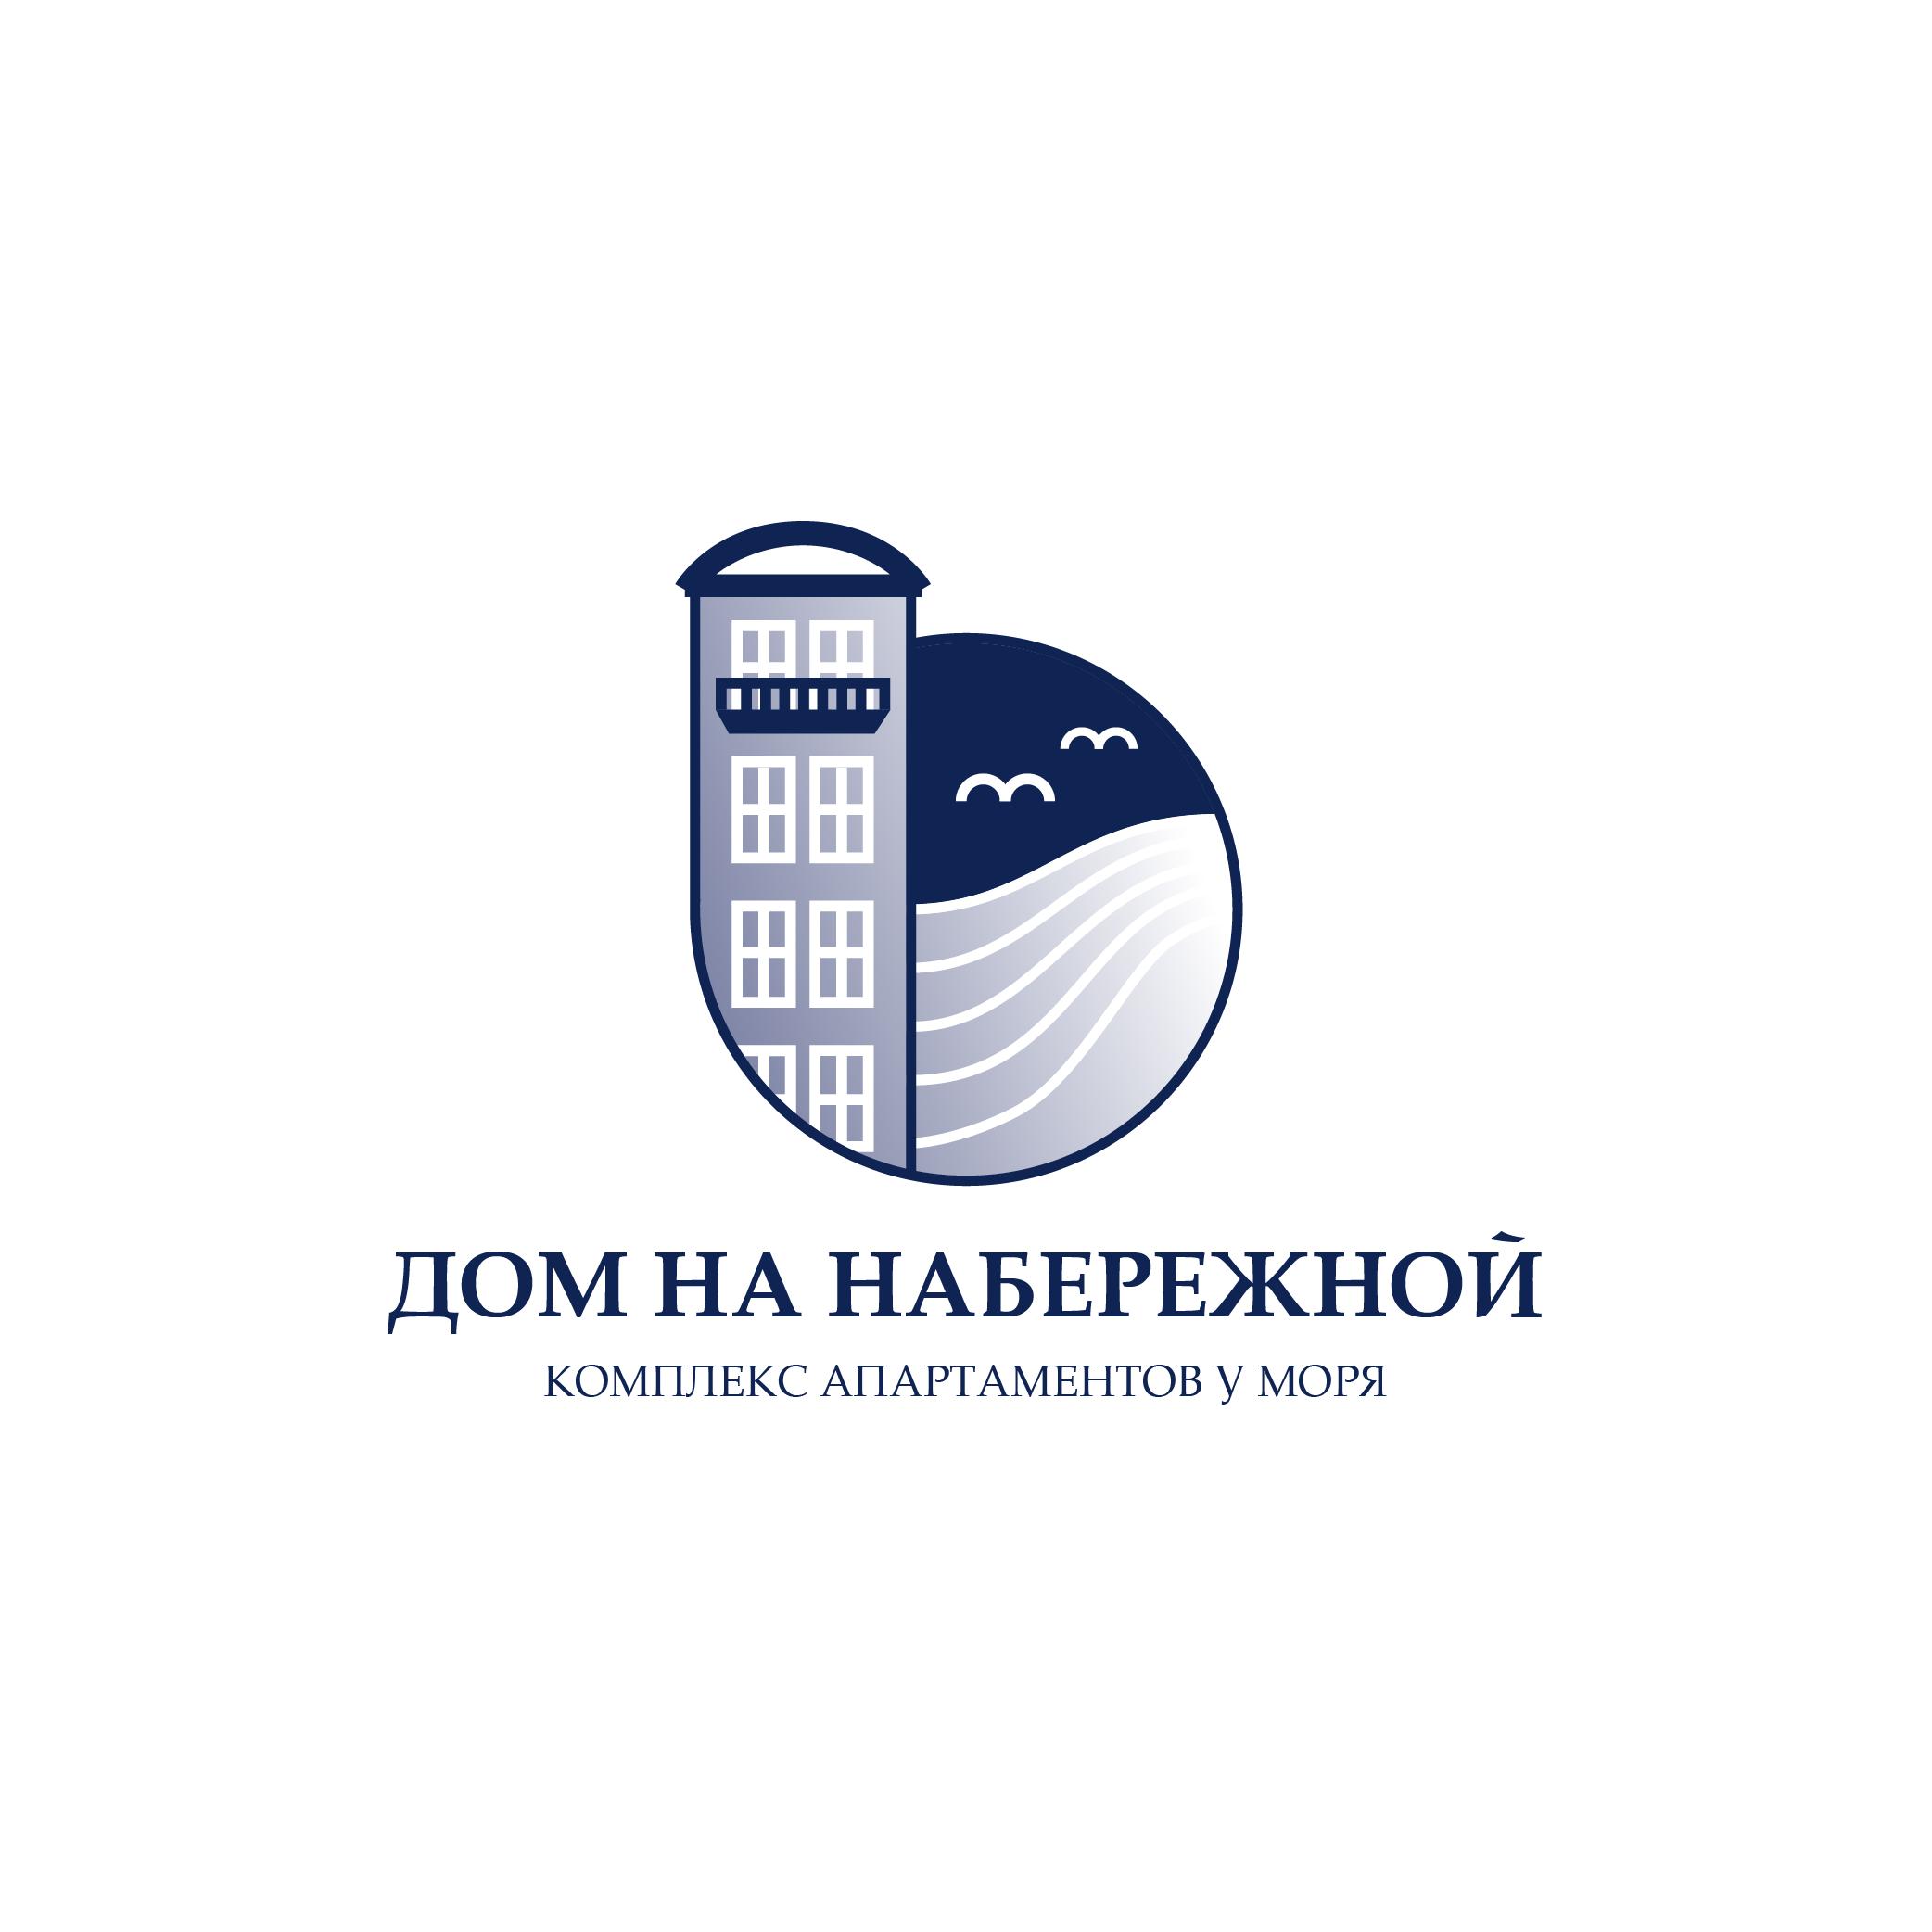 РАЗРАБОТКА логотипа для ЖИЛОГО КОМПЛЕКСА премиум В АНАПЕ.  фото f_6095de7cc7b8483b.png